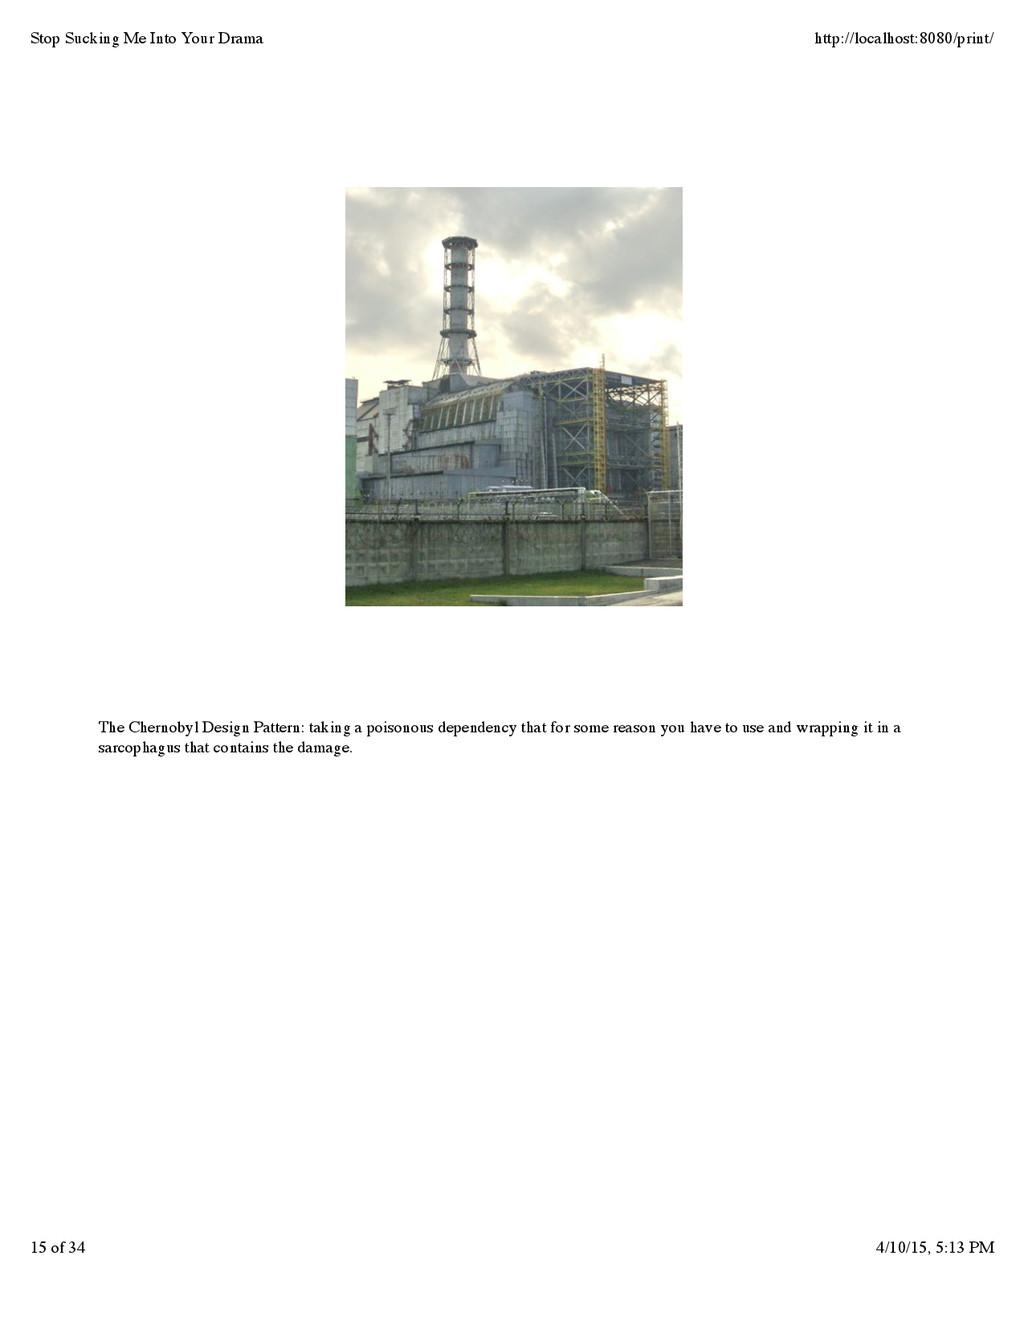 The Chernobyl Design Pattern: taking a poisonou...